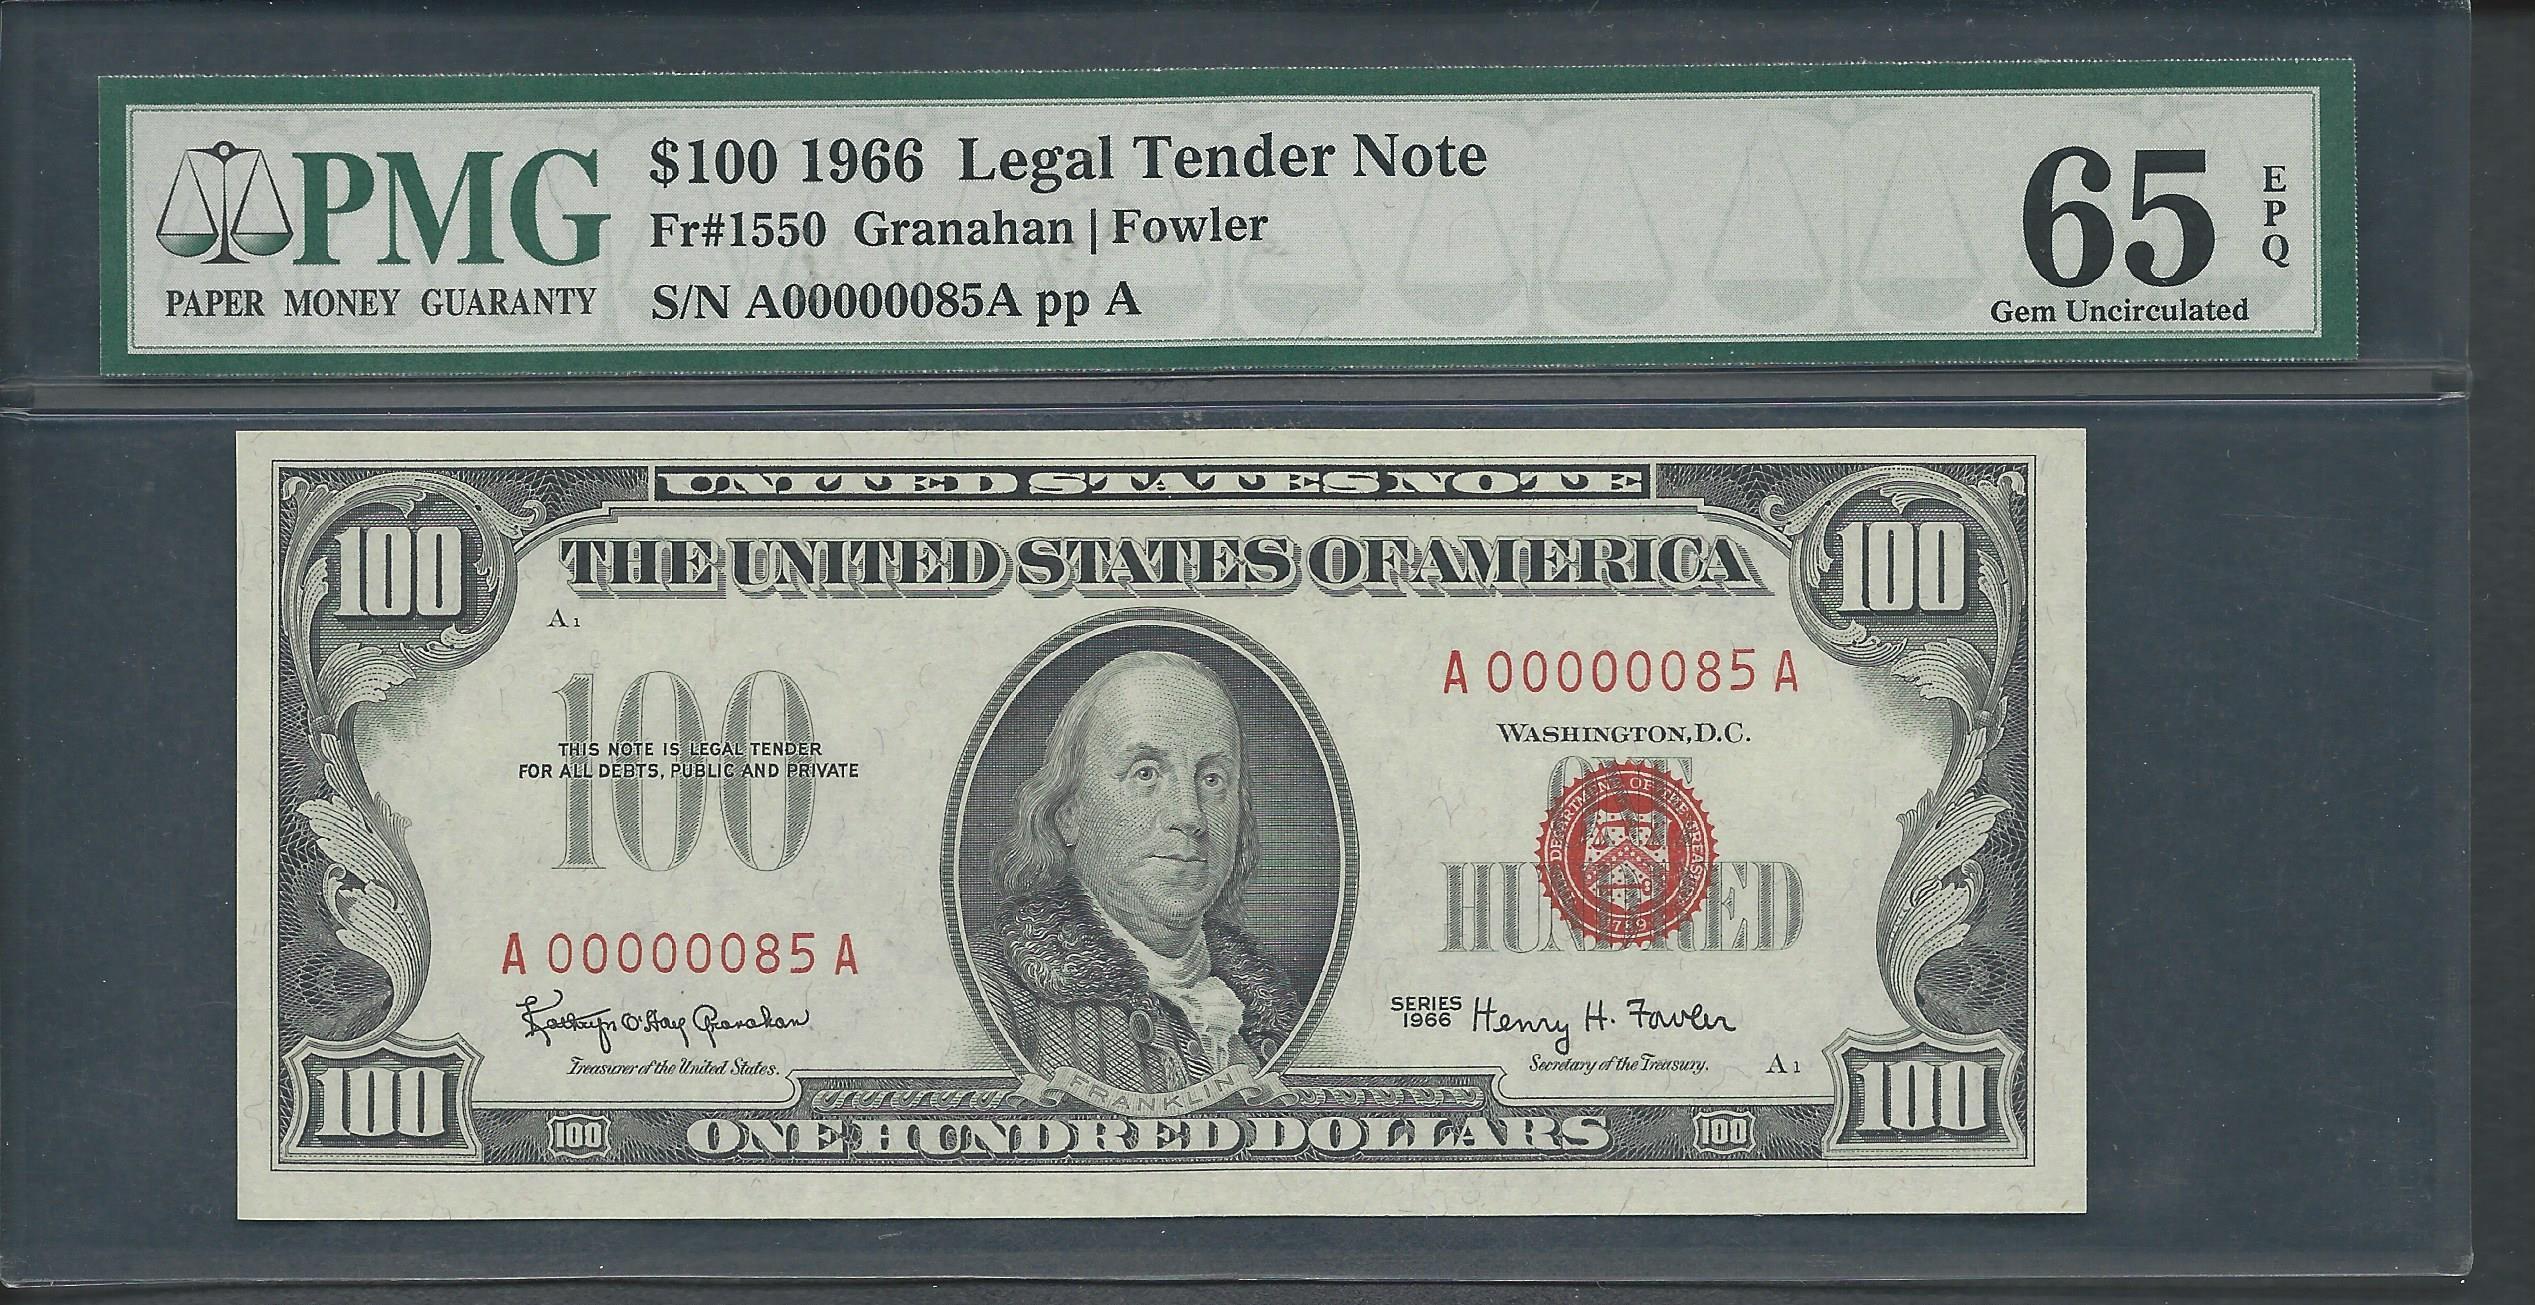 100 1966 SN a00000085A.jpg